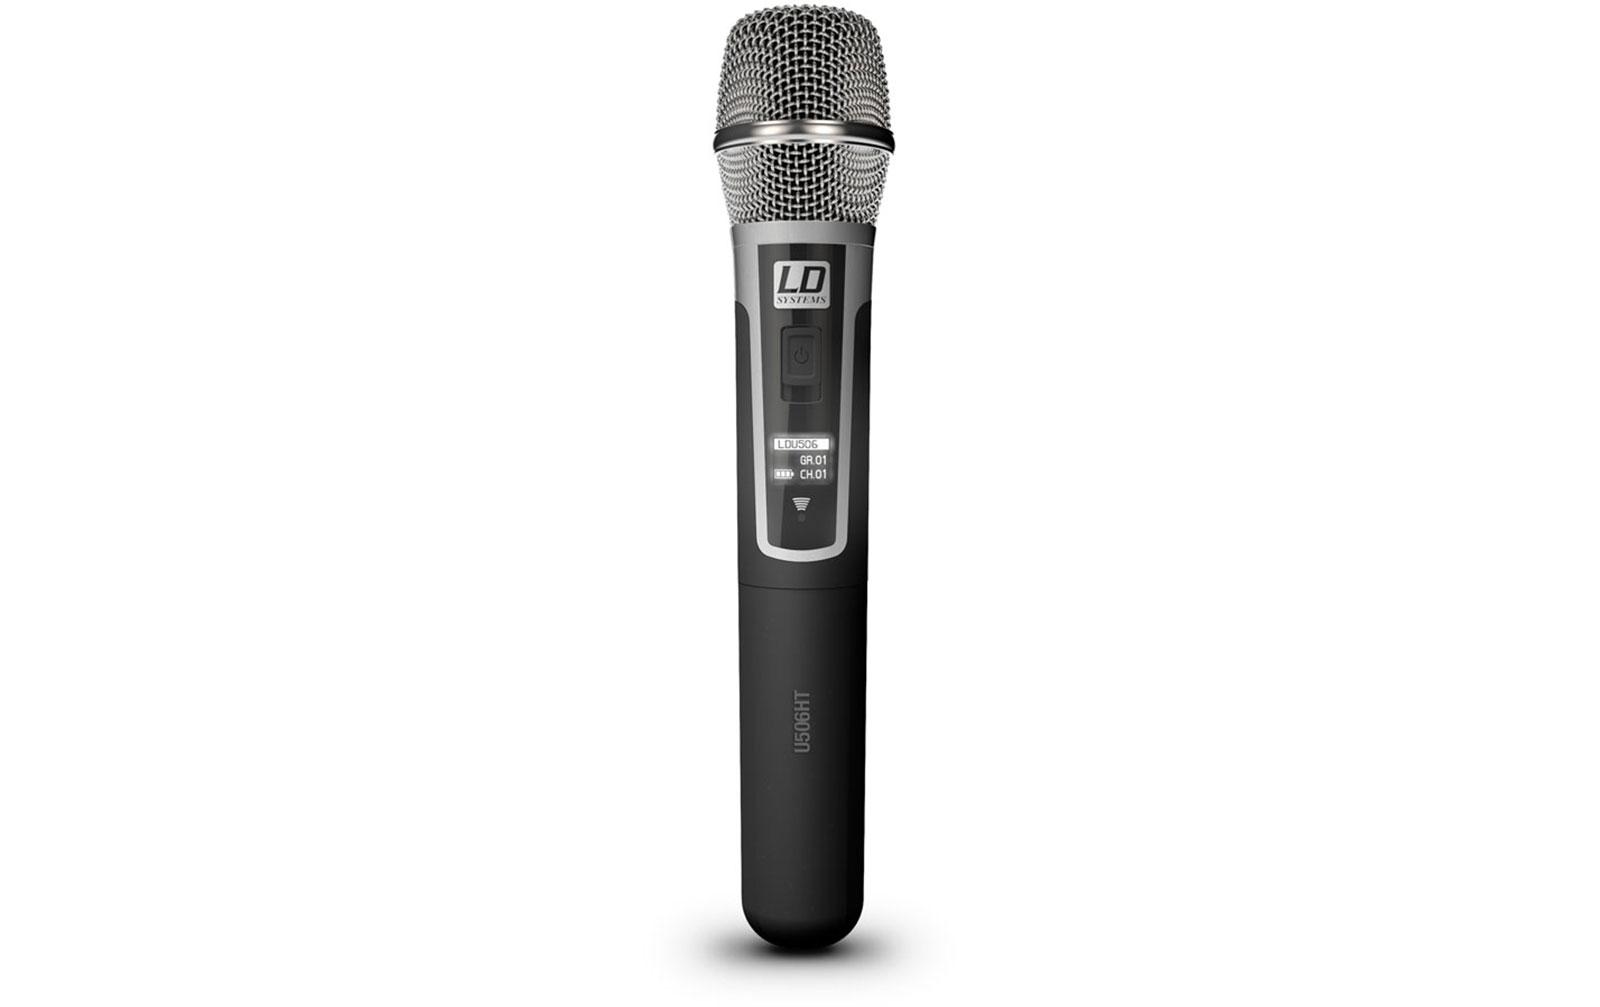 ld-systems-u506-mc-handmikrofon-kondensator